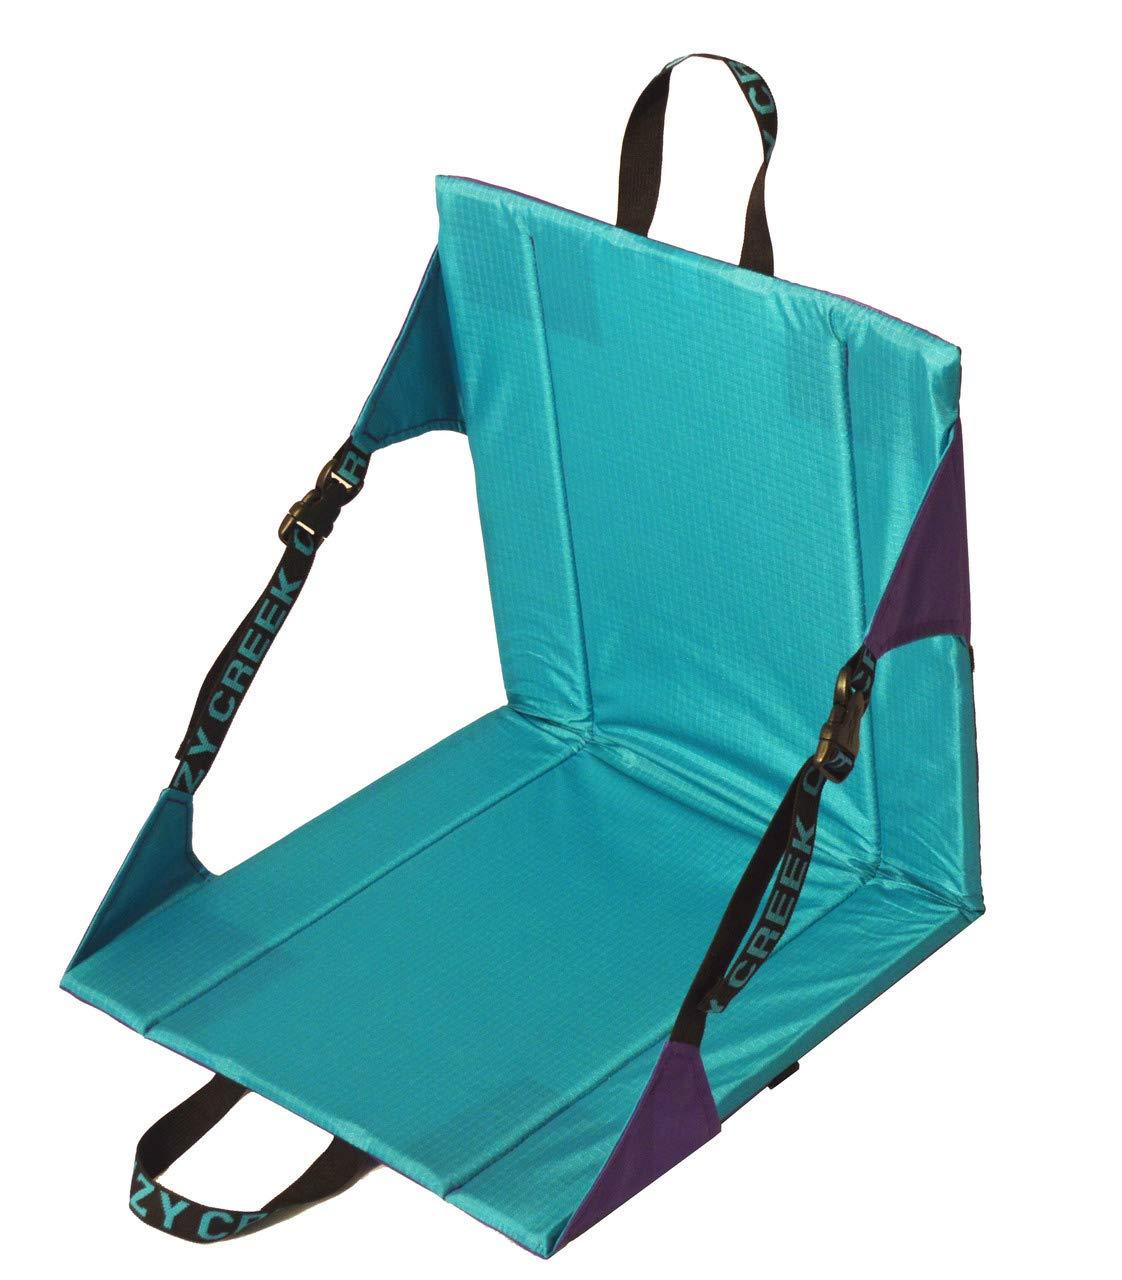 Crazy Creek Original Chair – The Original Lightweight Padded Folding Chair – Purple Teal